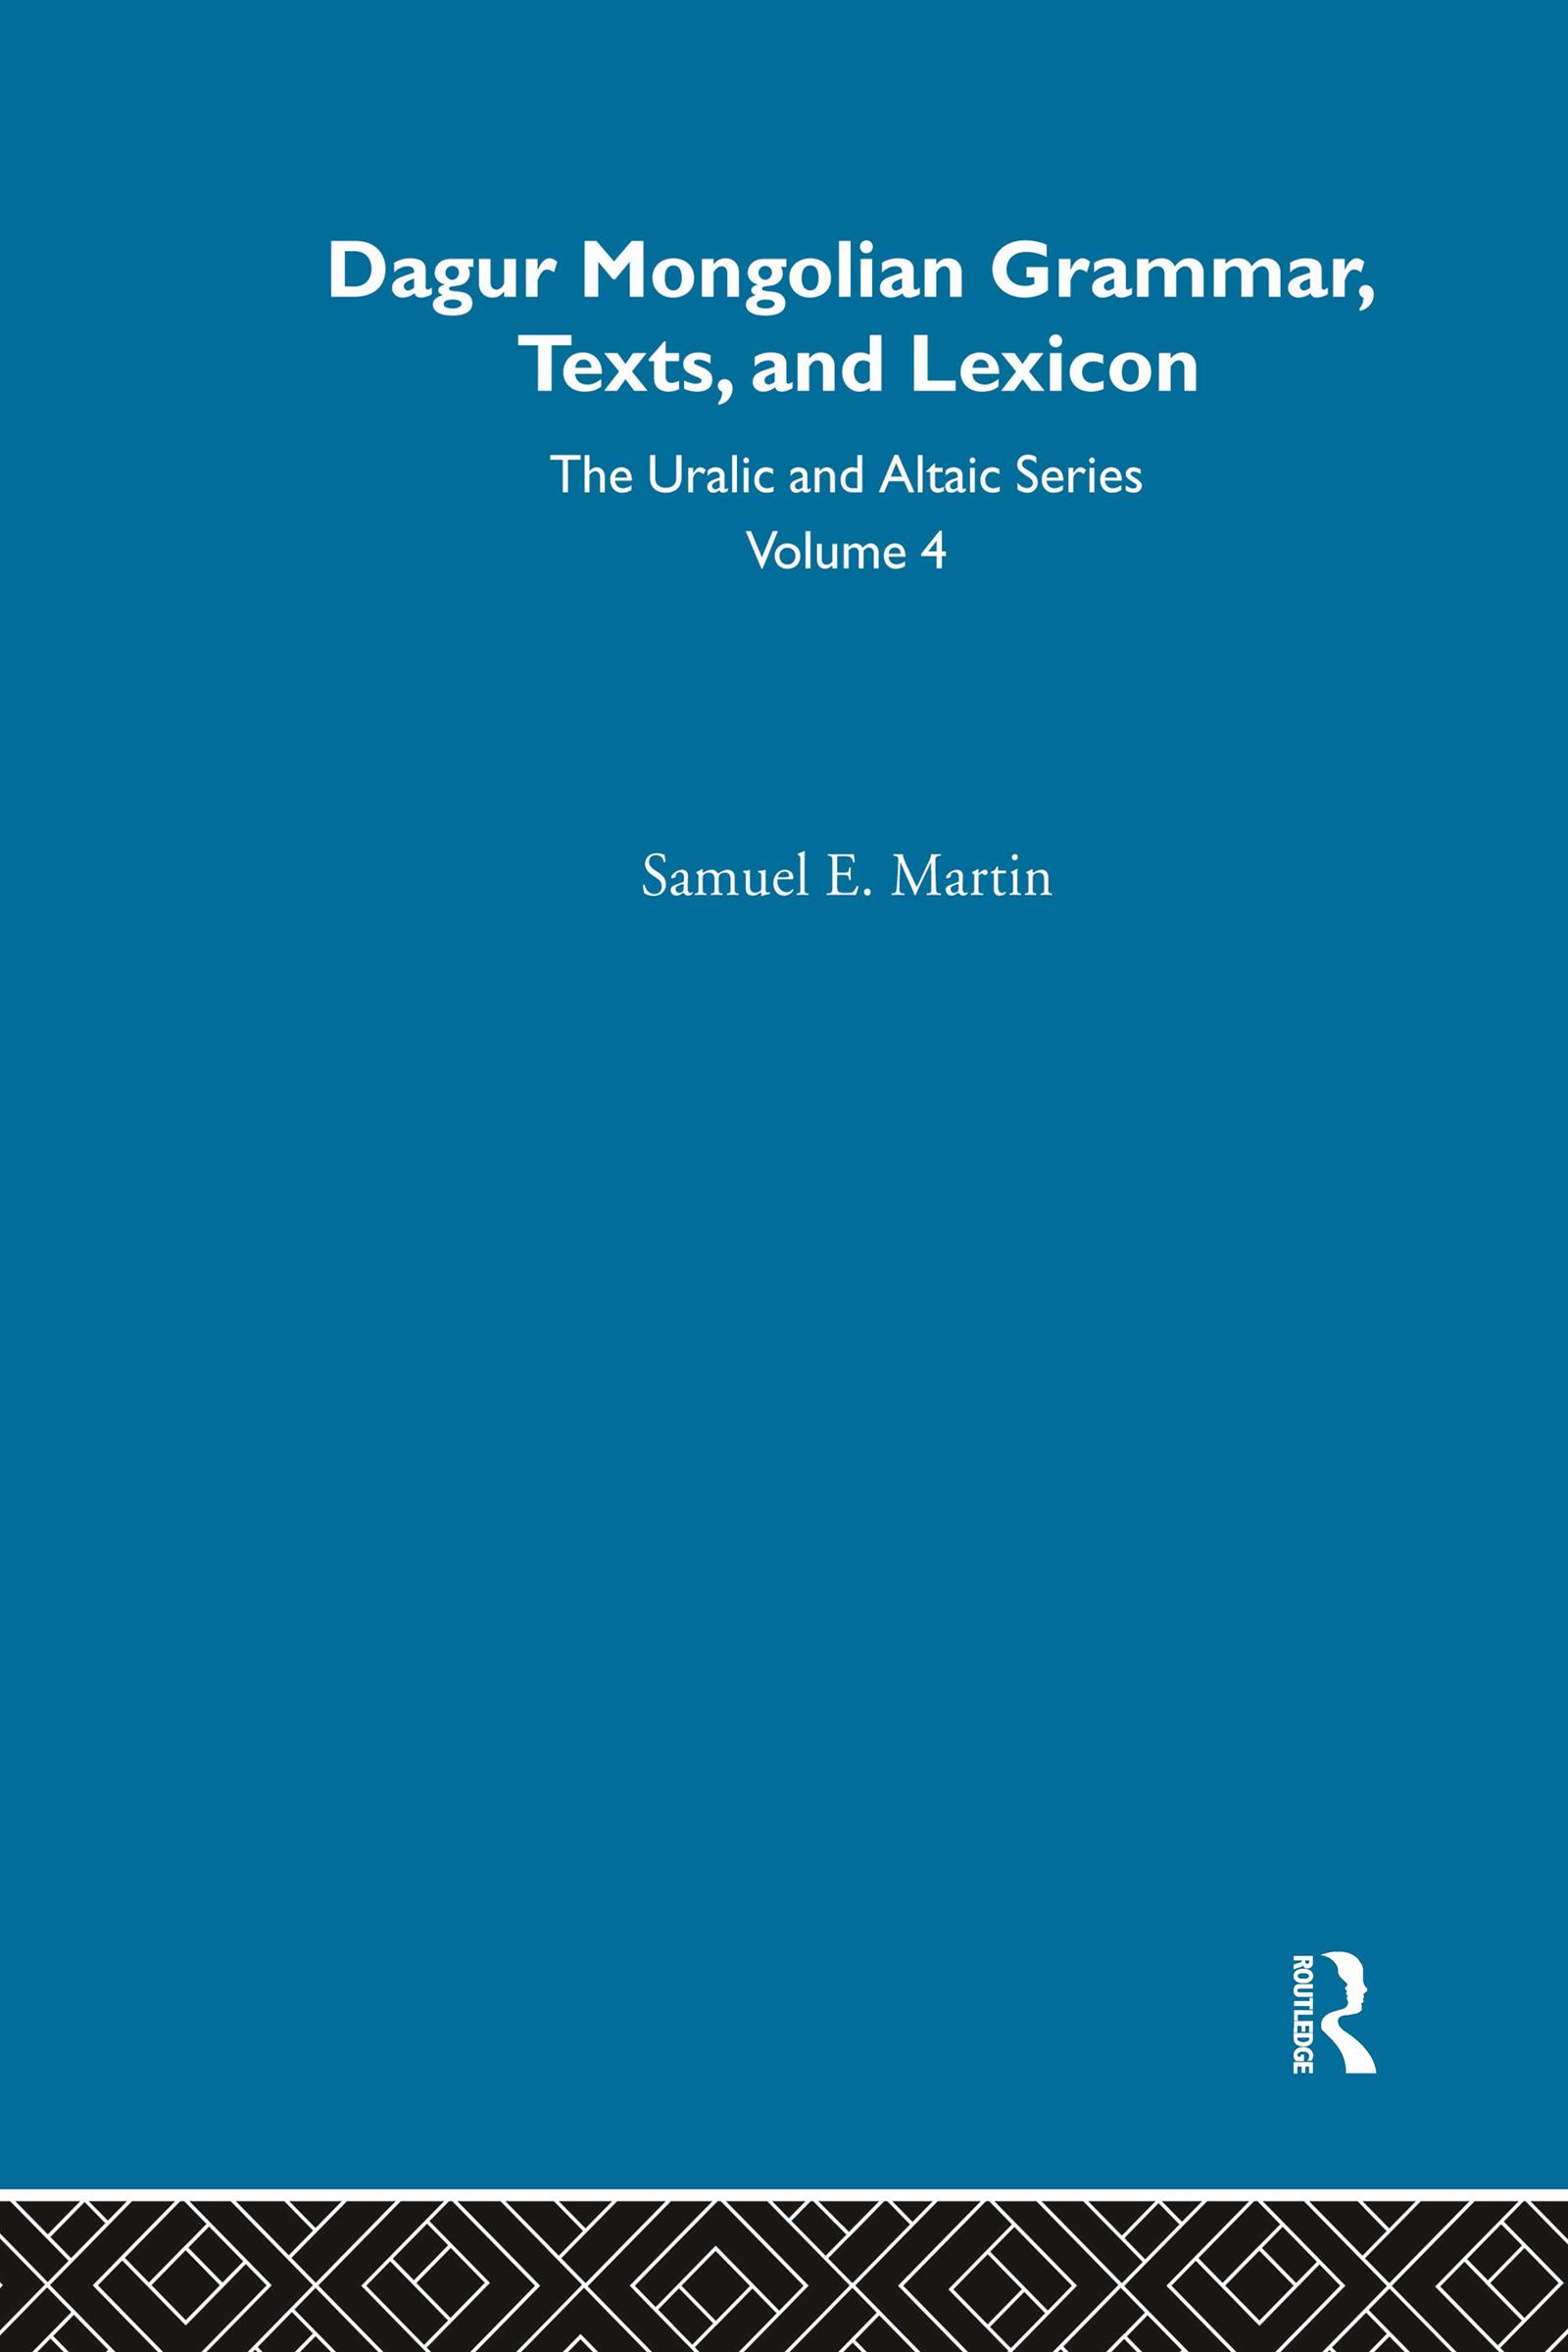 Dagur Mongolian